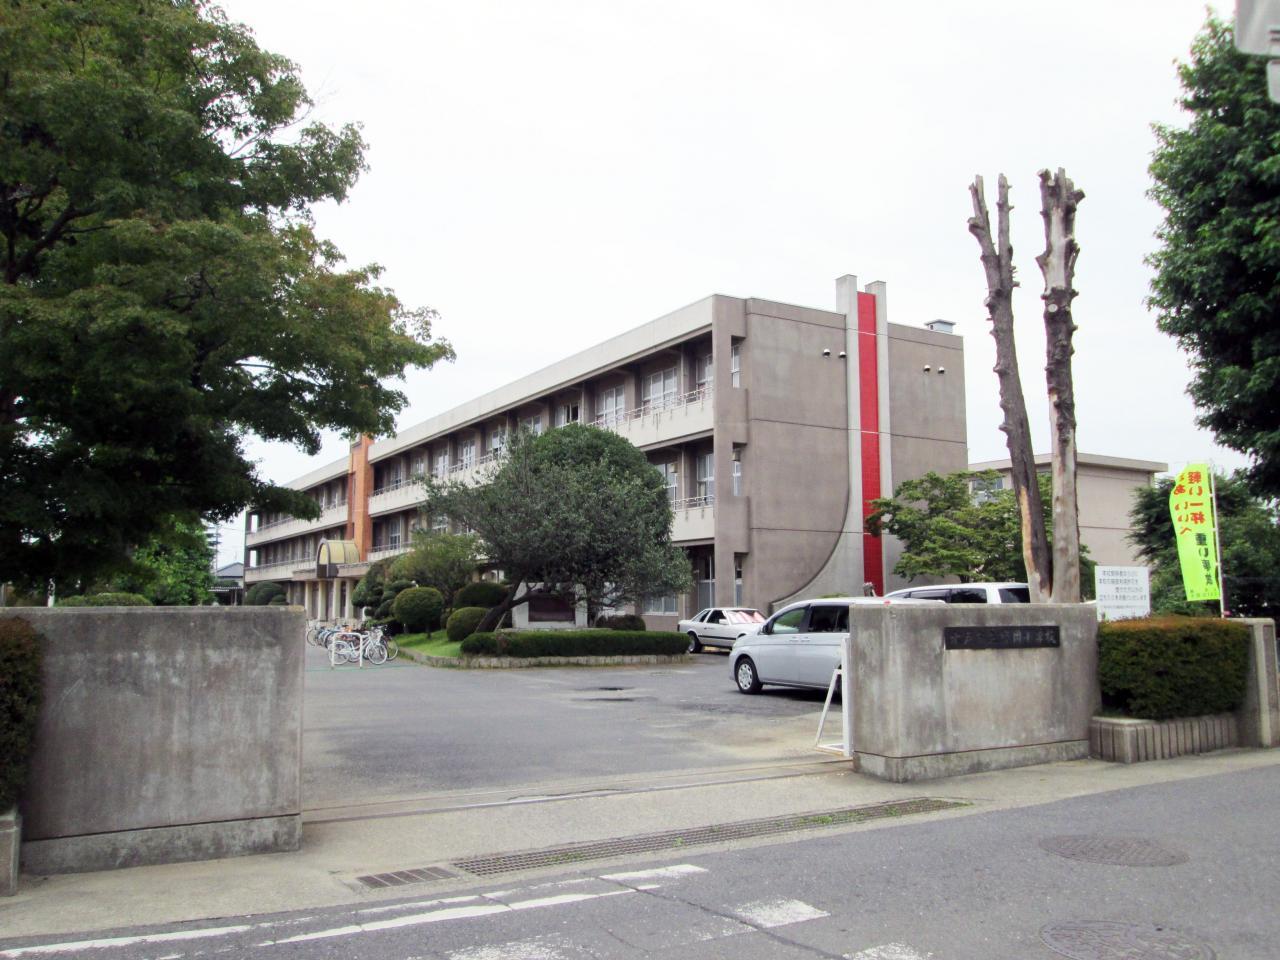 土地 水戸市千波町 JR常磐線(取手〜いわき)水戸駅 980万円